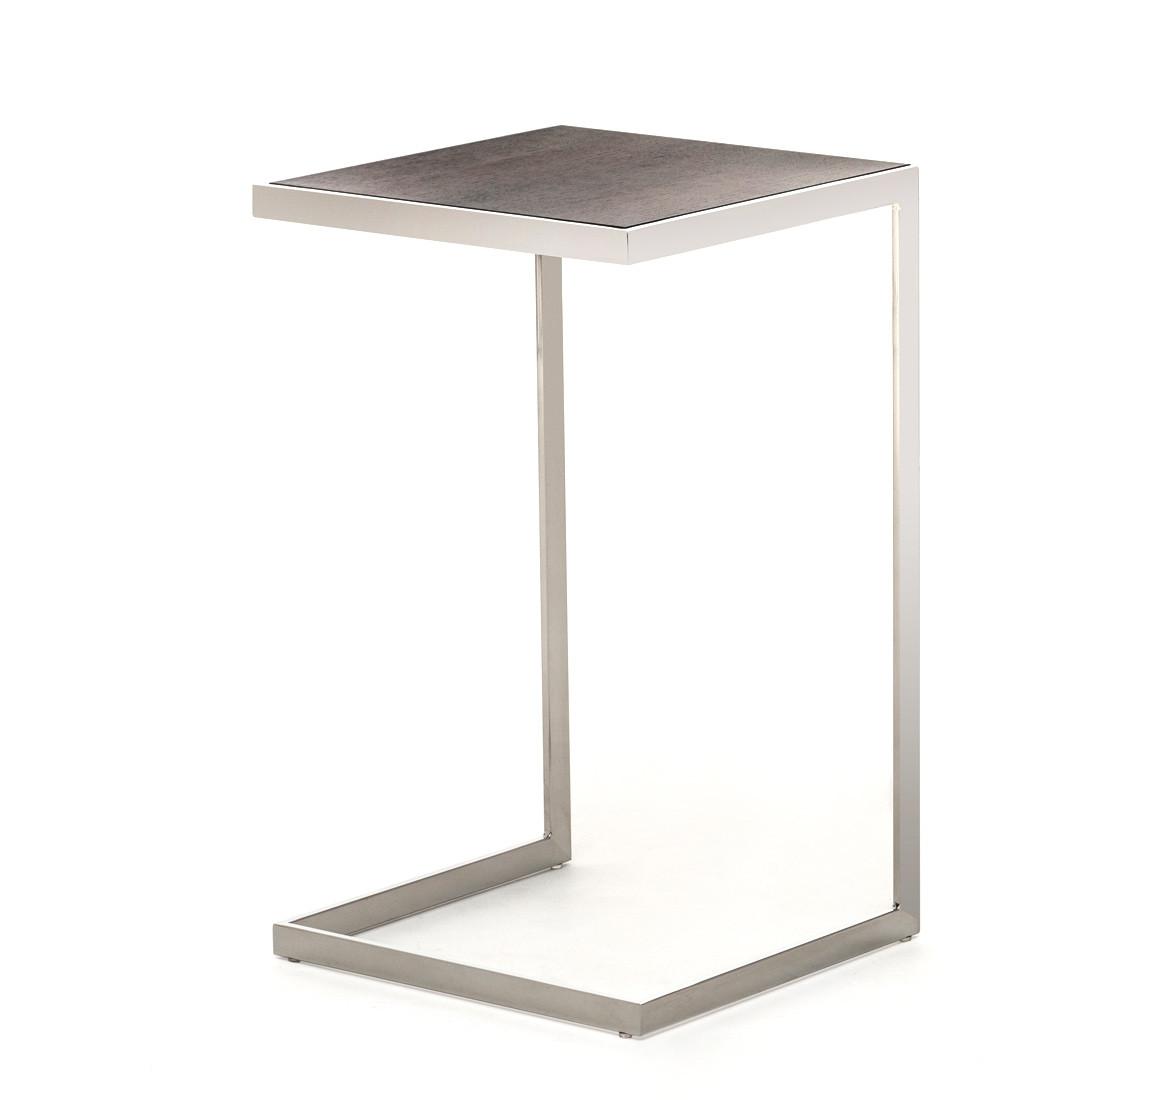 Стол кофейный TOWER T250AA00DA / 0CRO010 Дуб темный